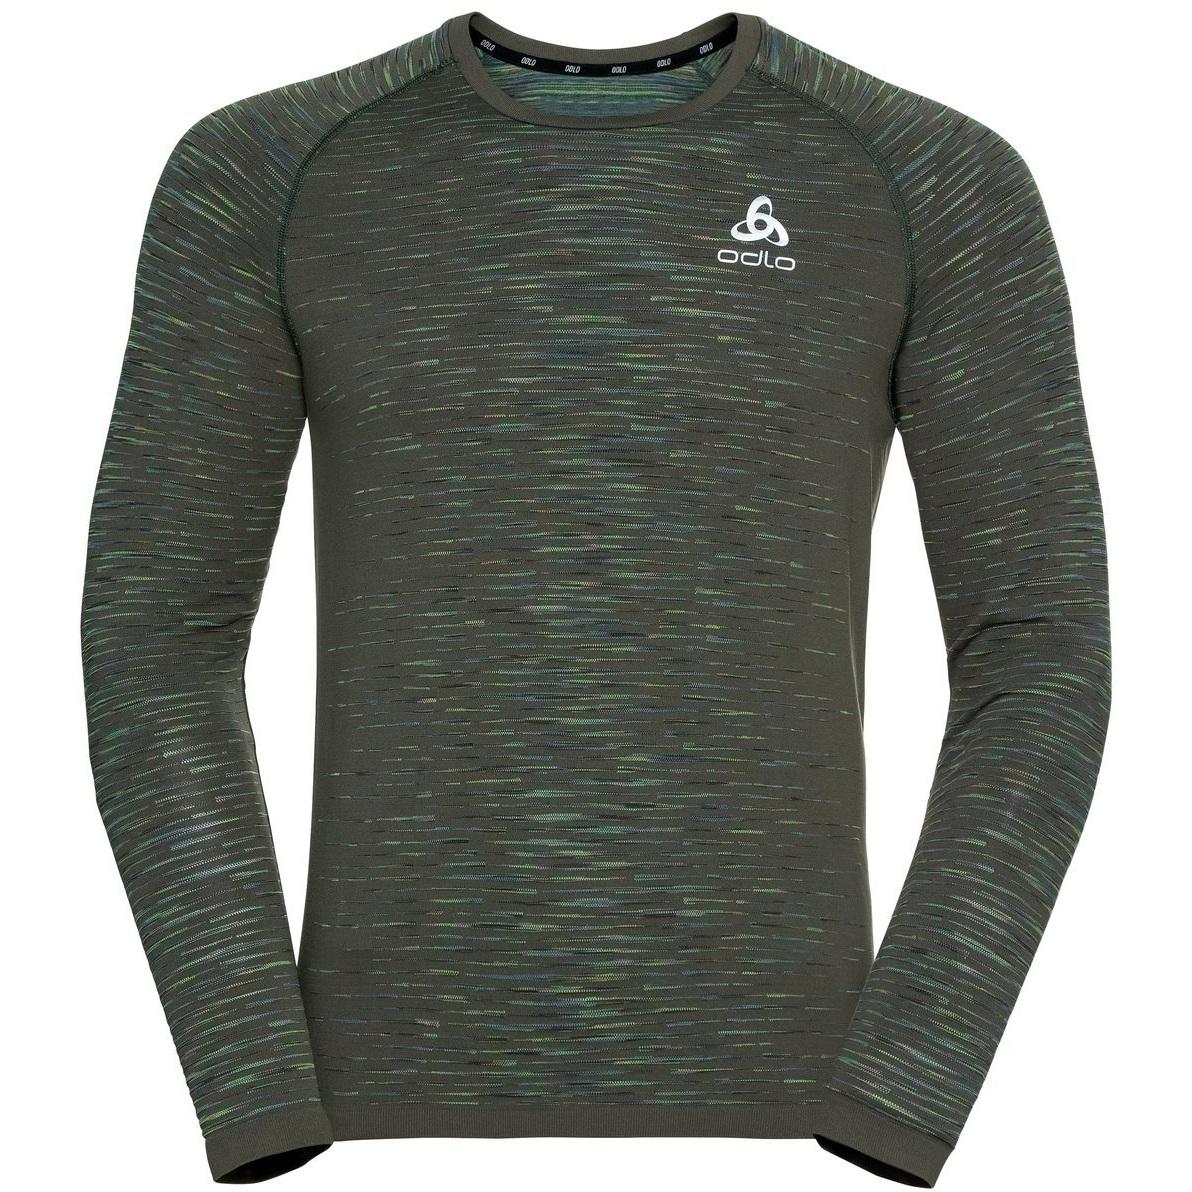 Produktbild von Odlo Herren BLACKCOMB CERAMICOOL Langarmshirt - climbing ivy - space dye